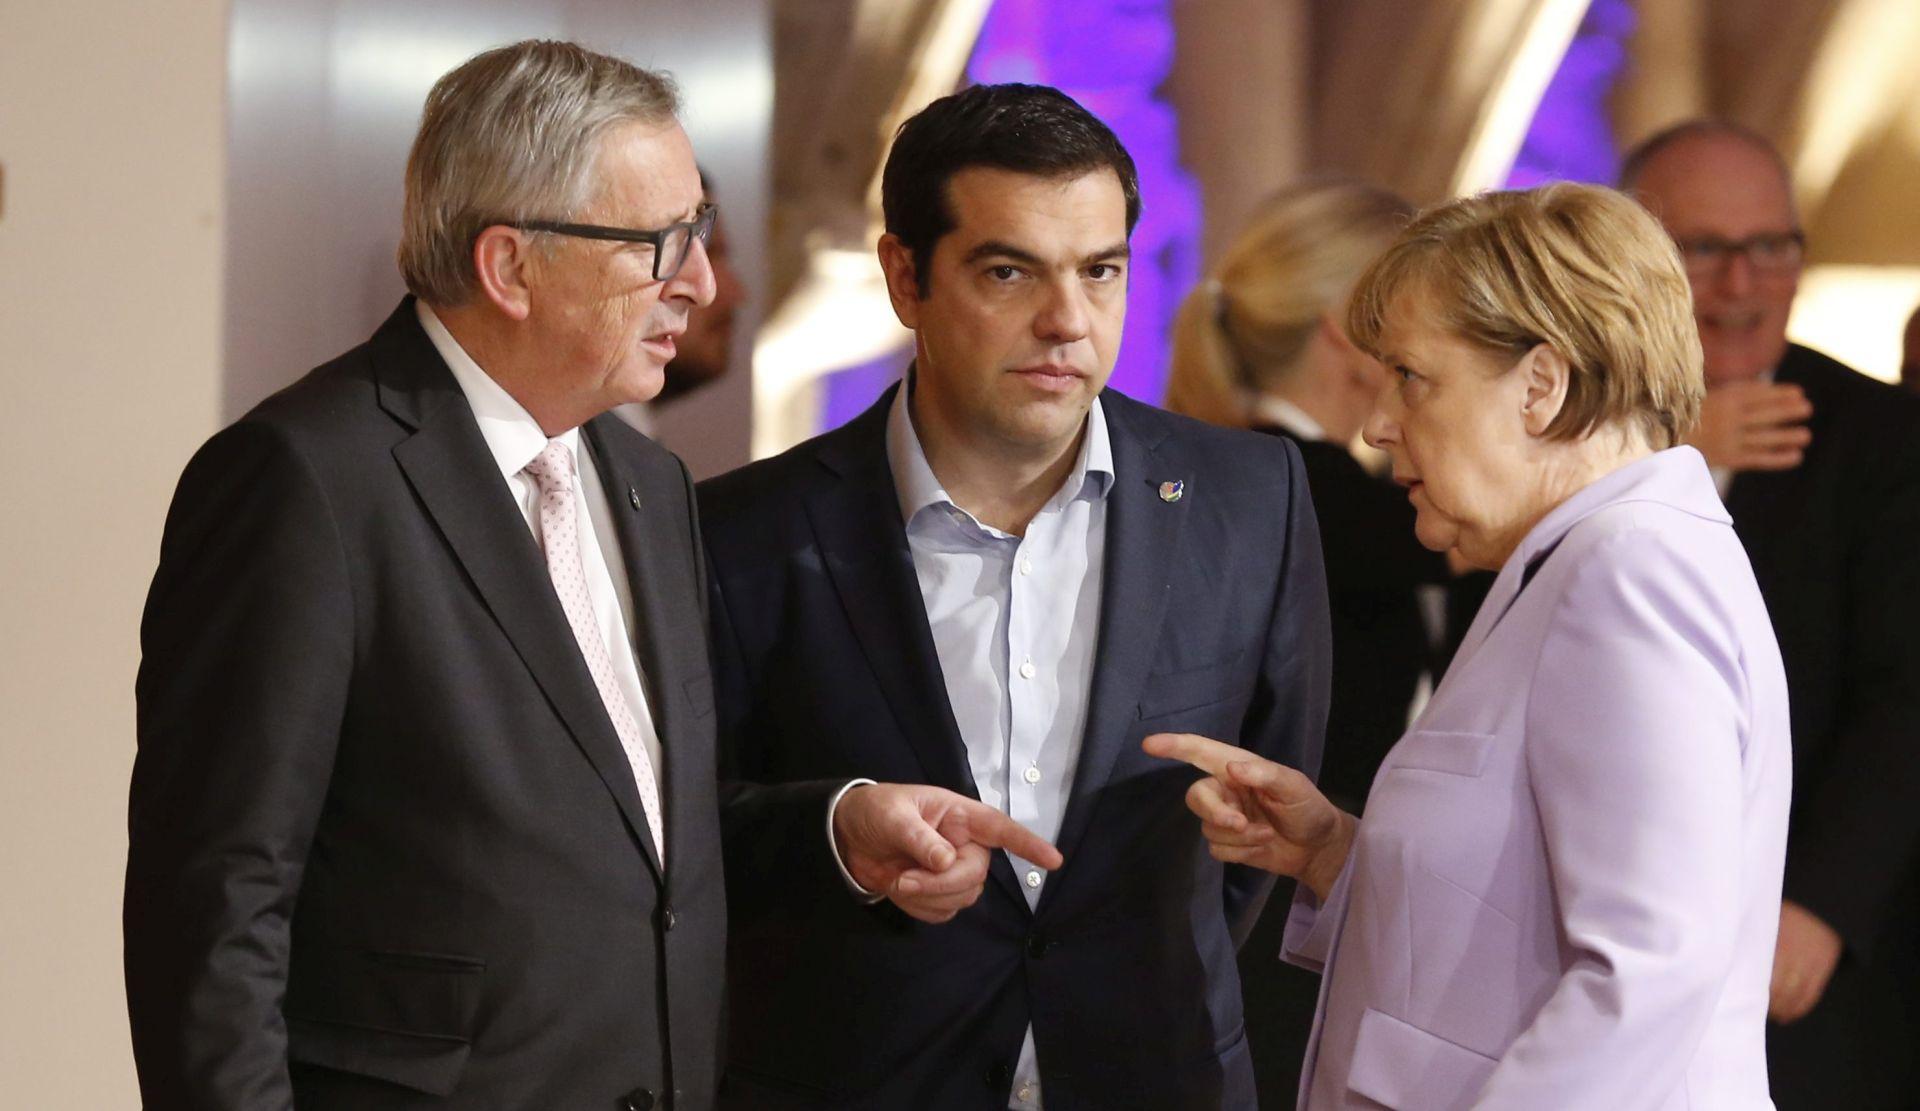 Juncker nezadovoljan sporošću provedbe programa relokacije izbjeglica